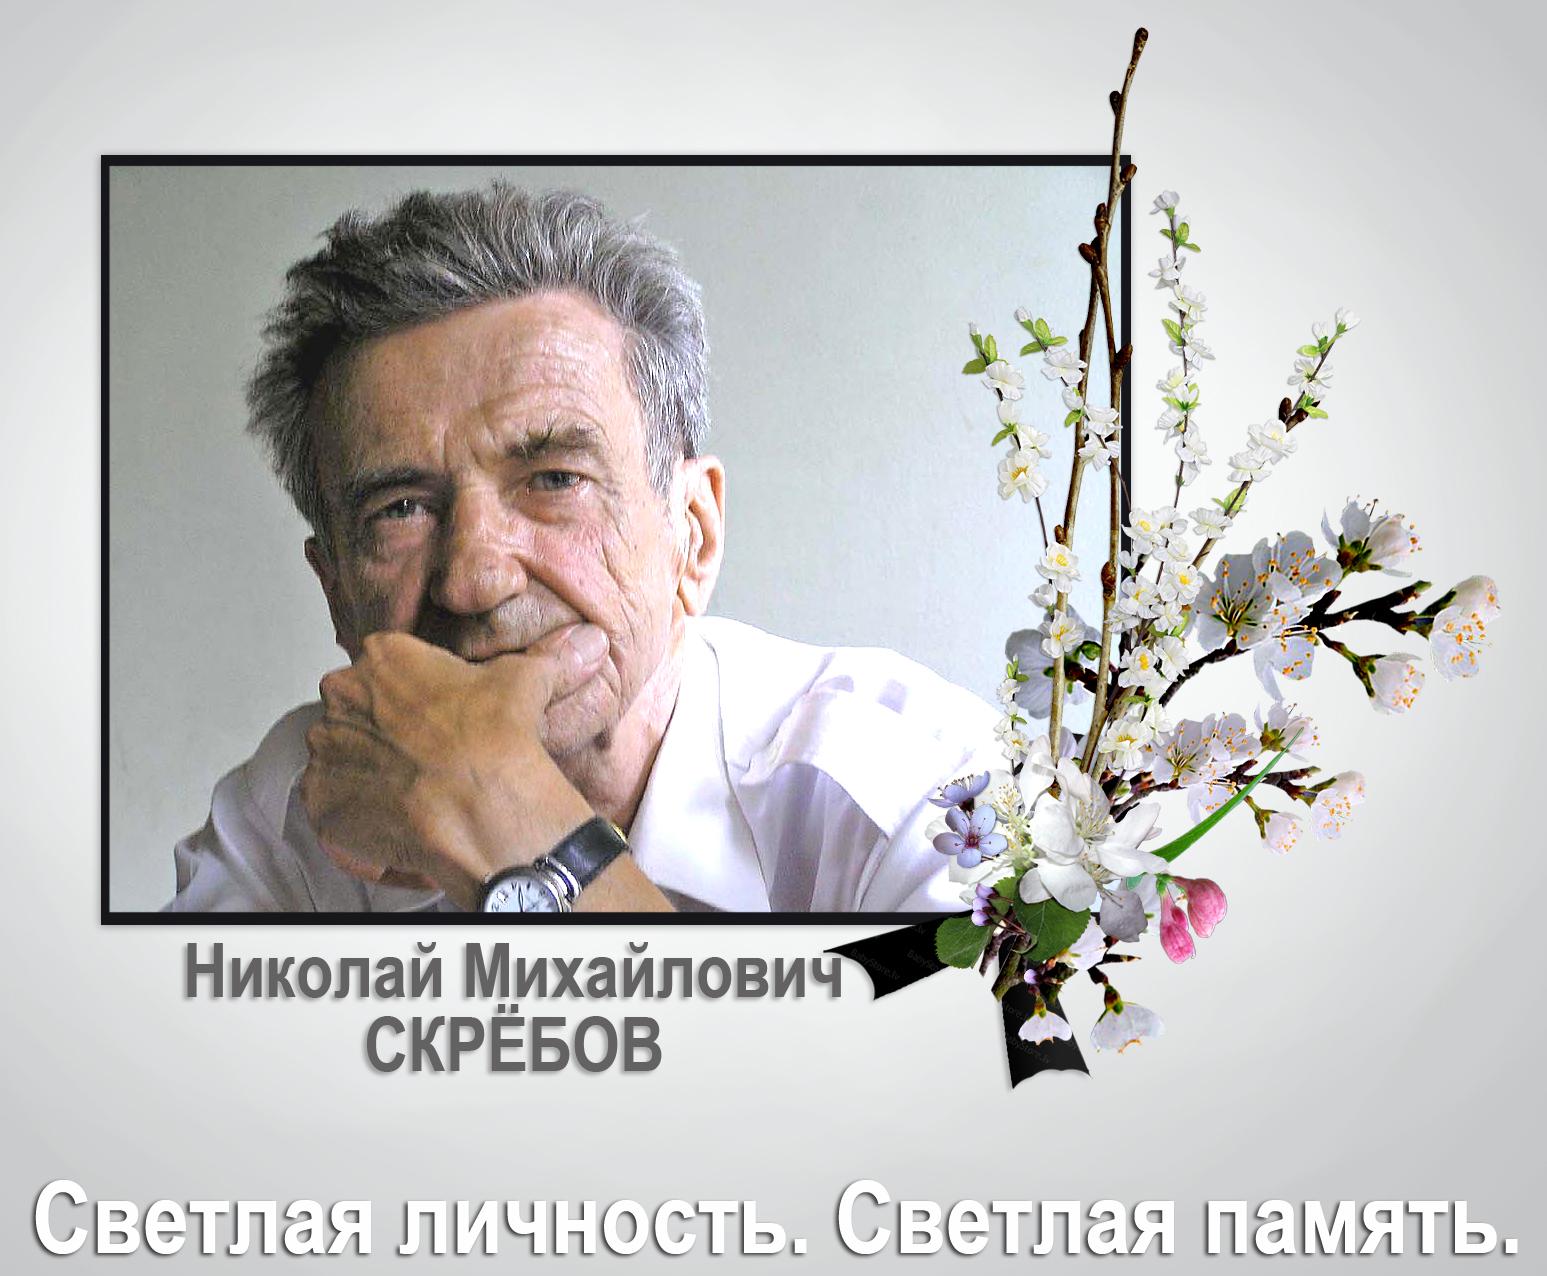 СКРЁБОВ О4 О3 2015